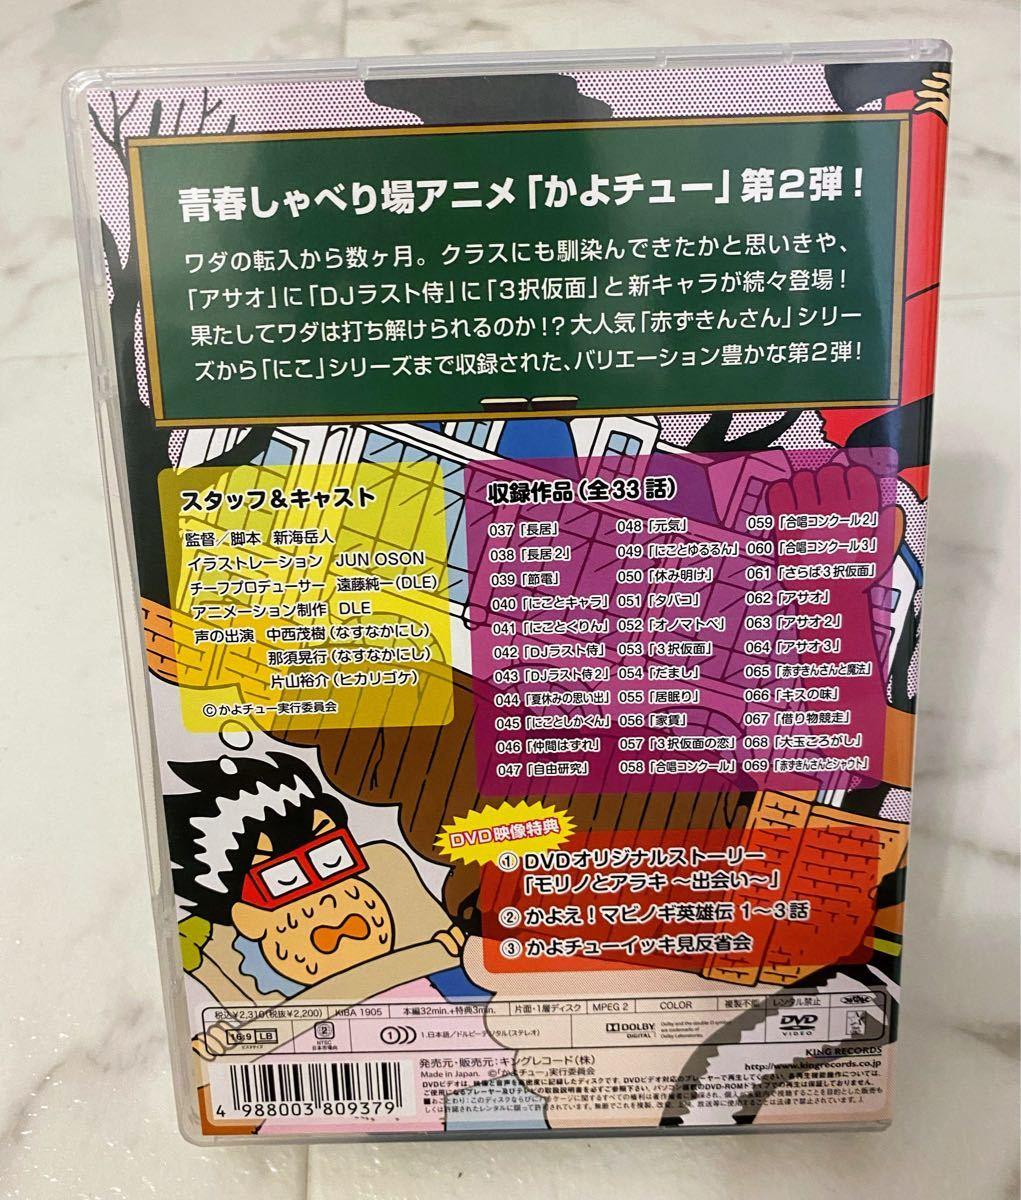 DVD かよえ!チュー学 2